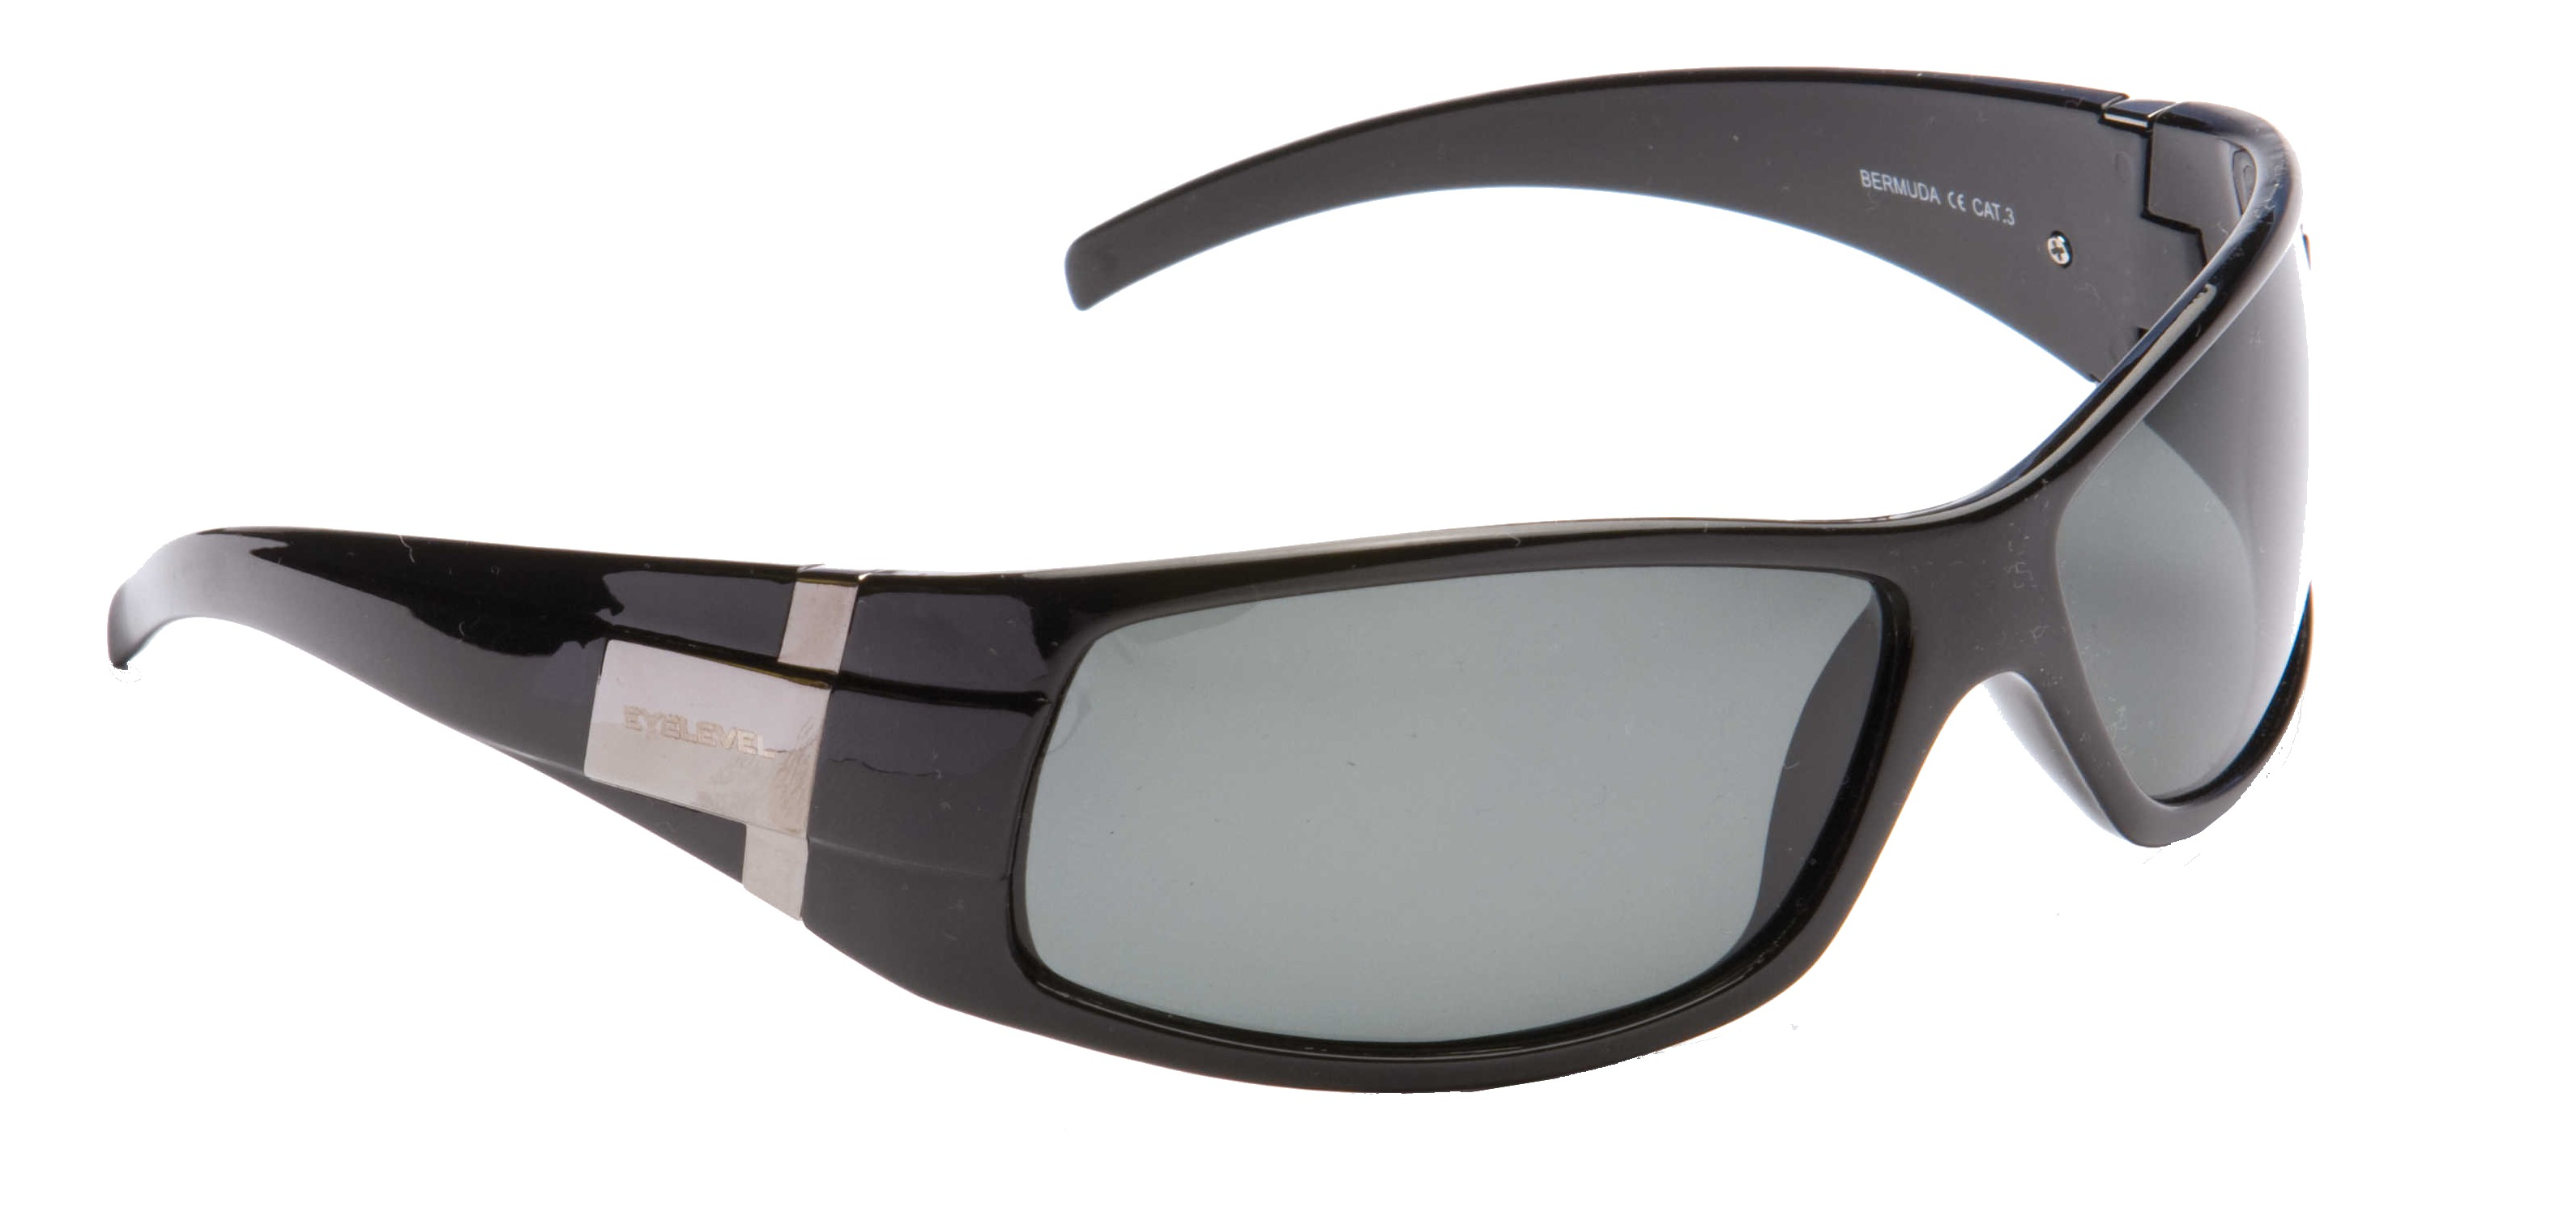 Best polarized sunglasses for carp fishing louisiana for Best polarized sunglasses for fishing